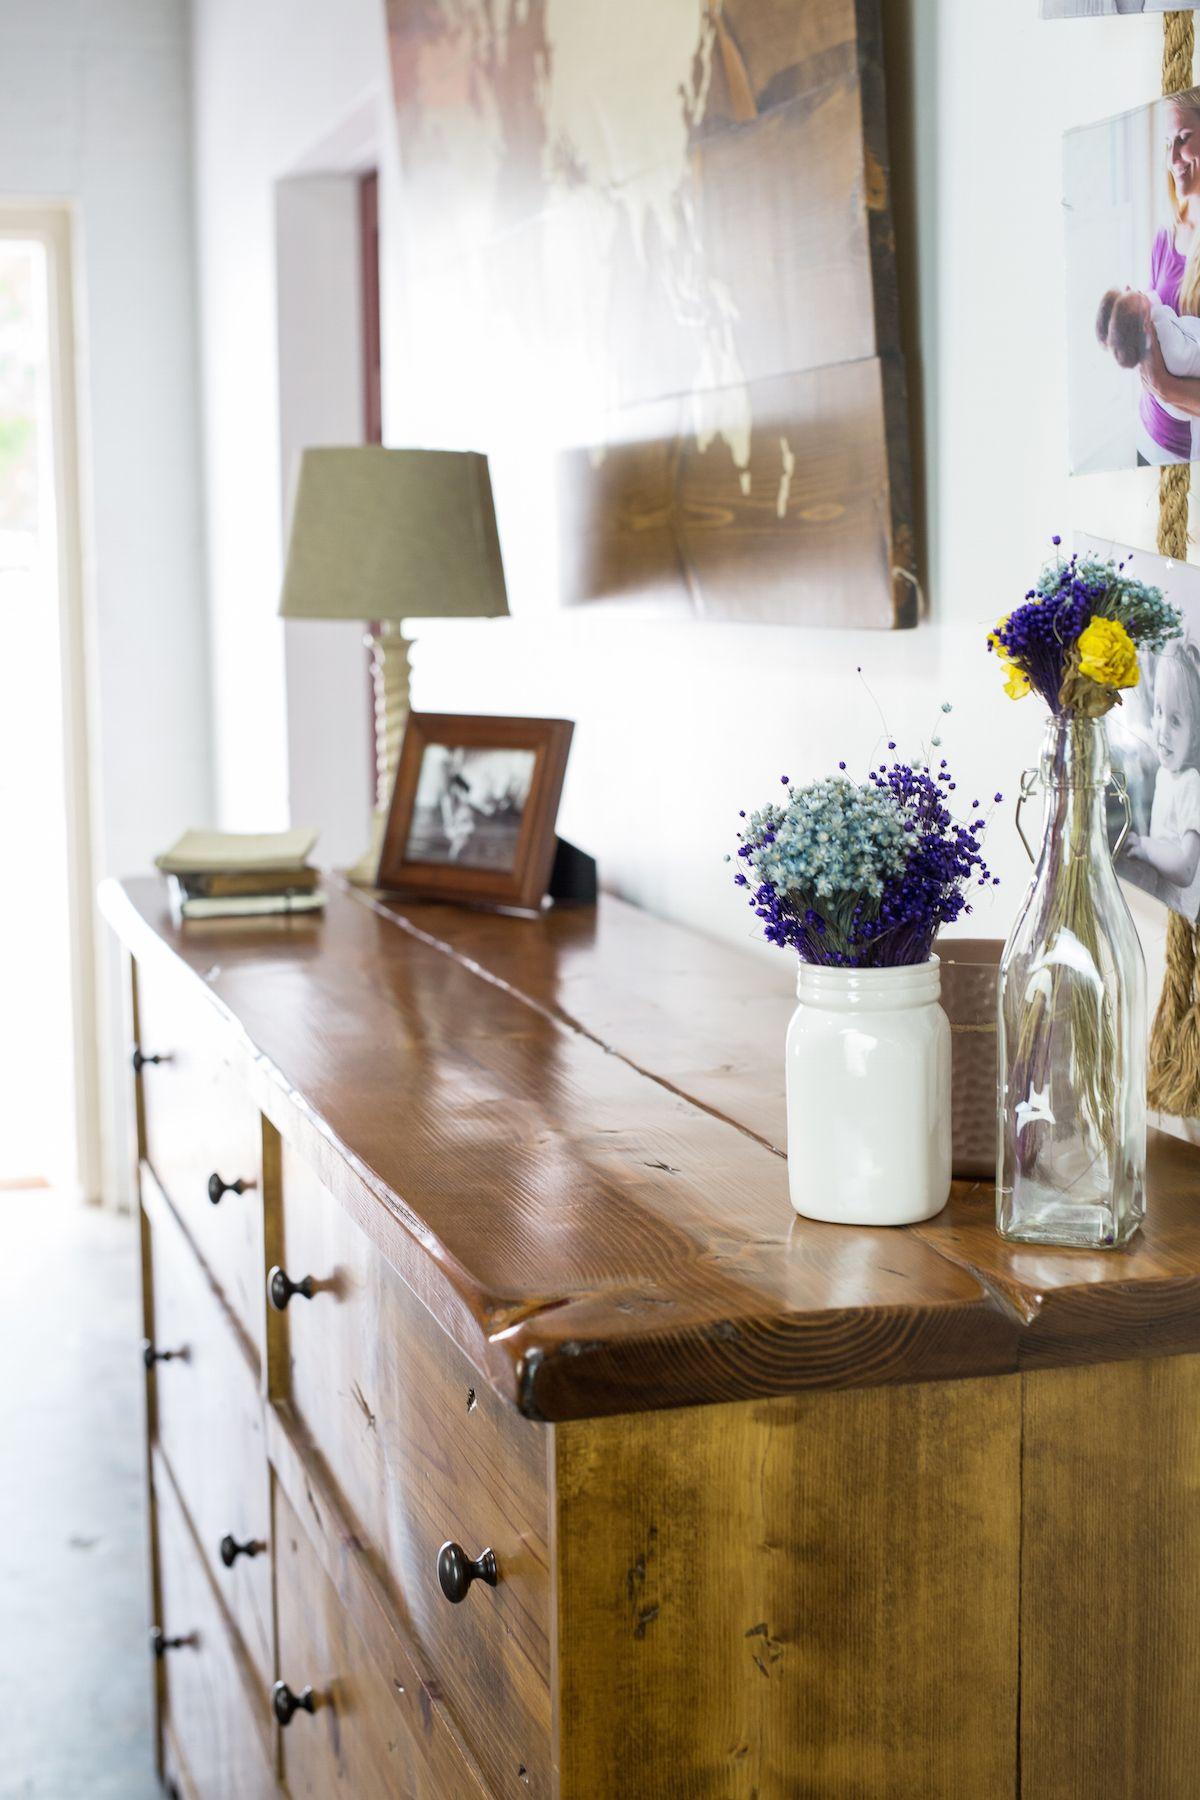 Anderson dresser spacious dressers in bedroom furniture sets